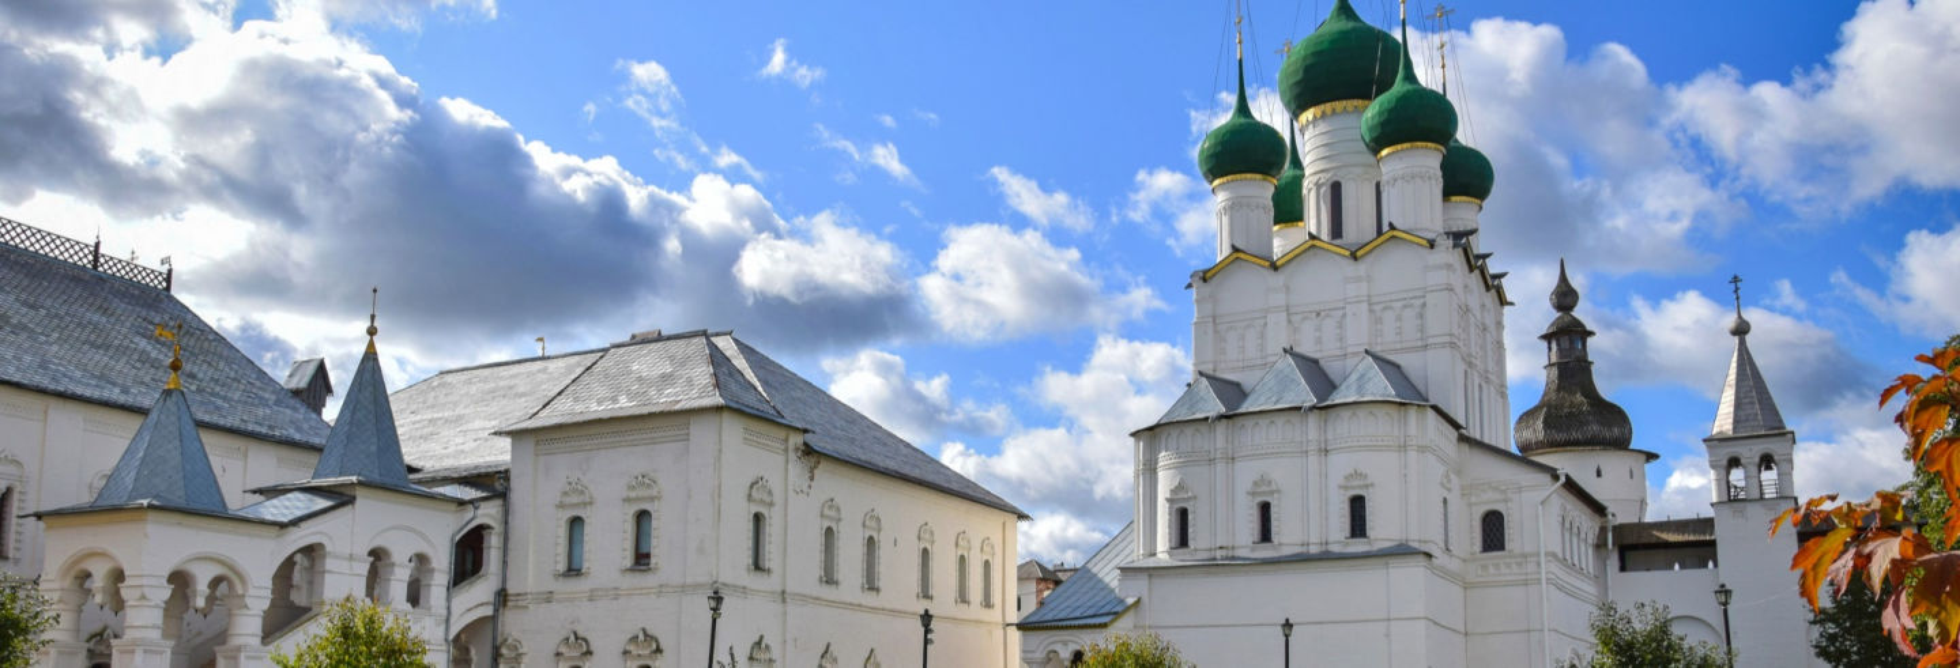 Visita guiada privada por Yaroslavl